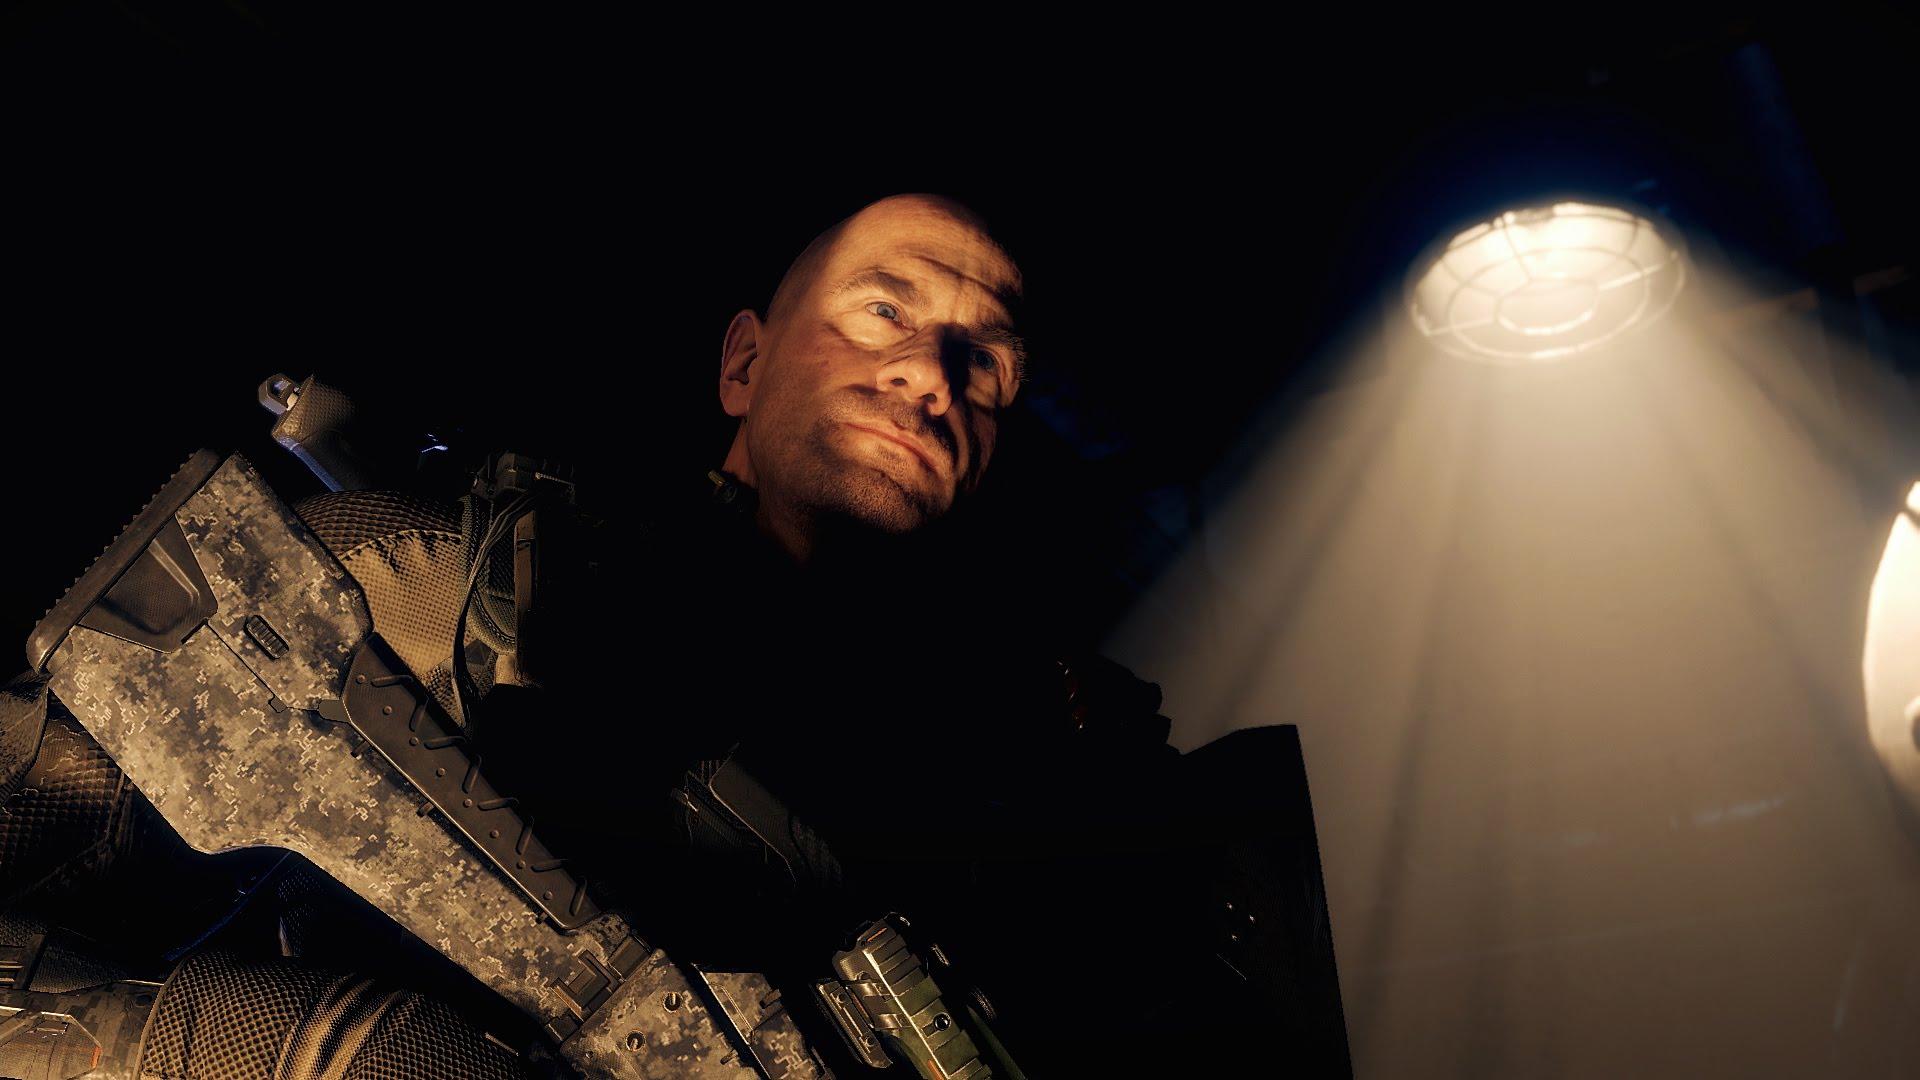 Call of Duty: Black Ops III, revela nuevo trailer de la historia